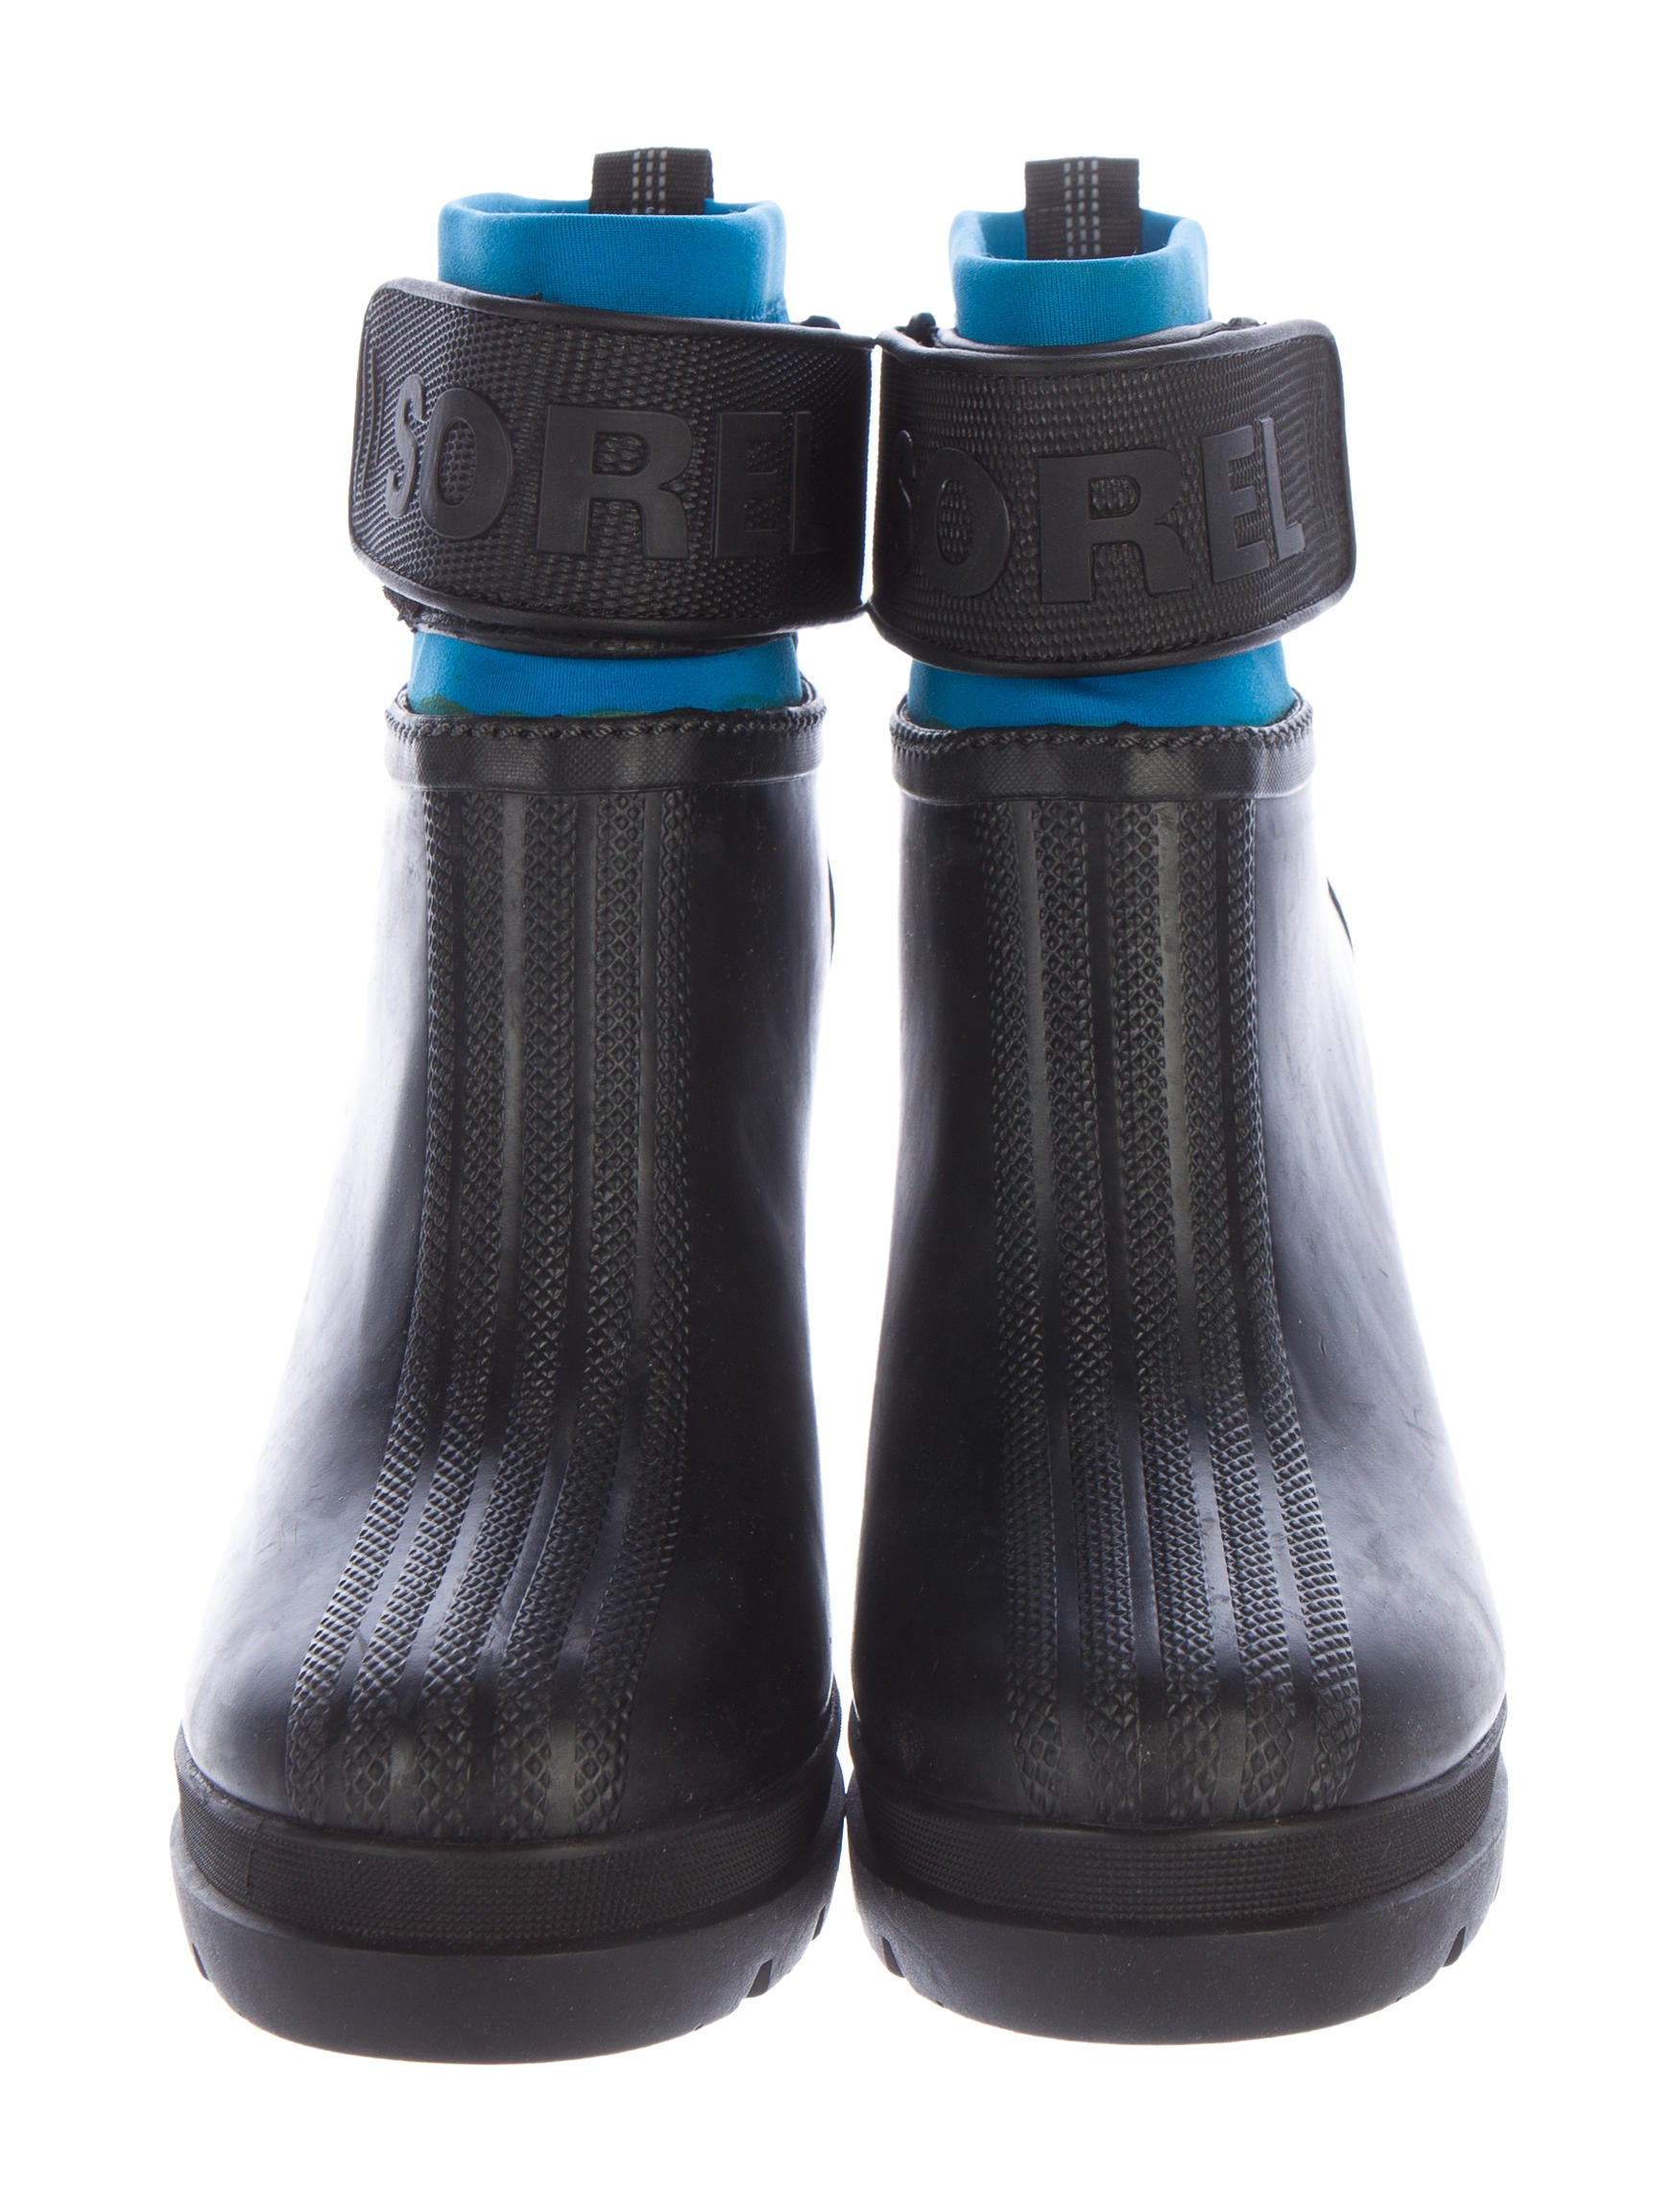 sorel rubber platform ankle boots shoes wsorl20129